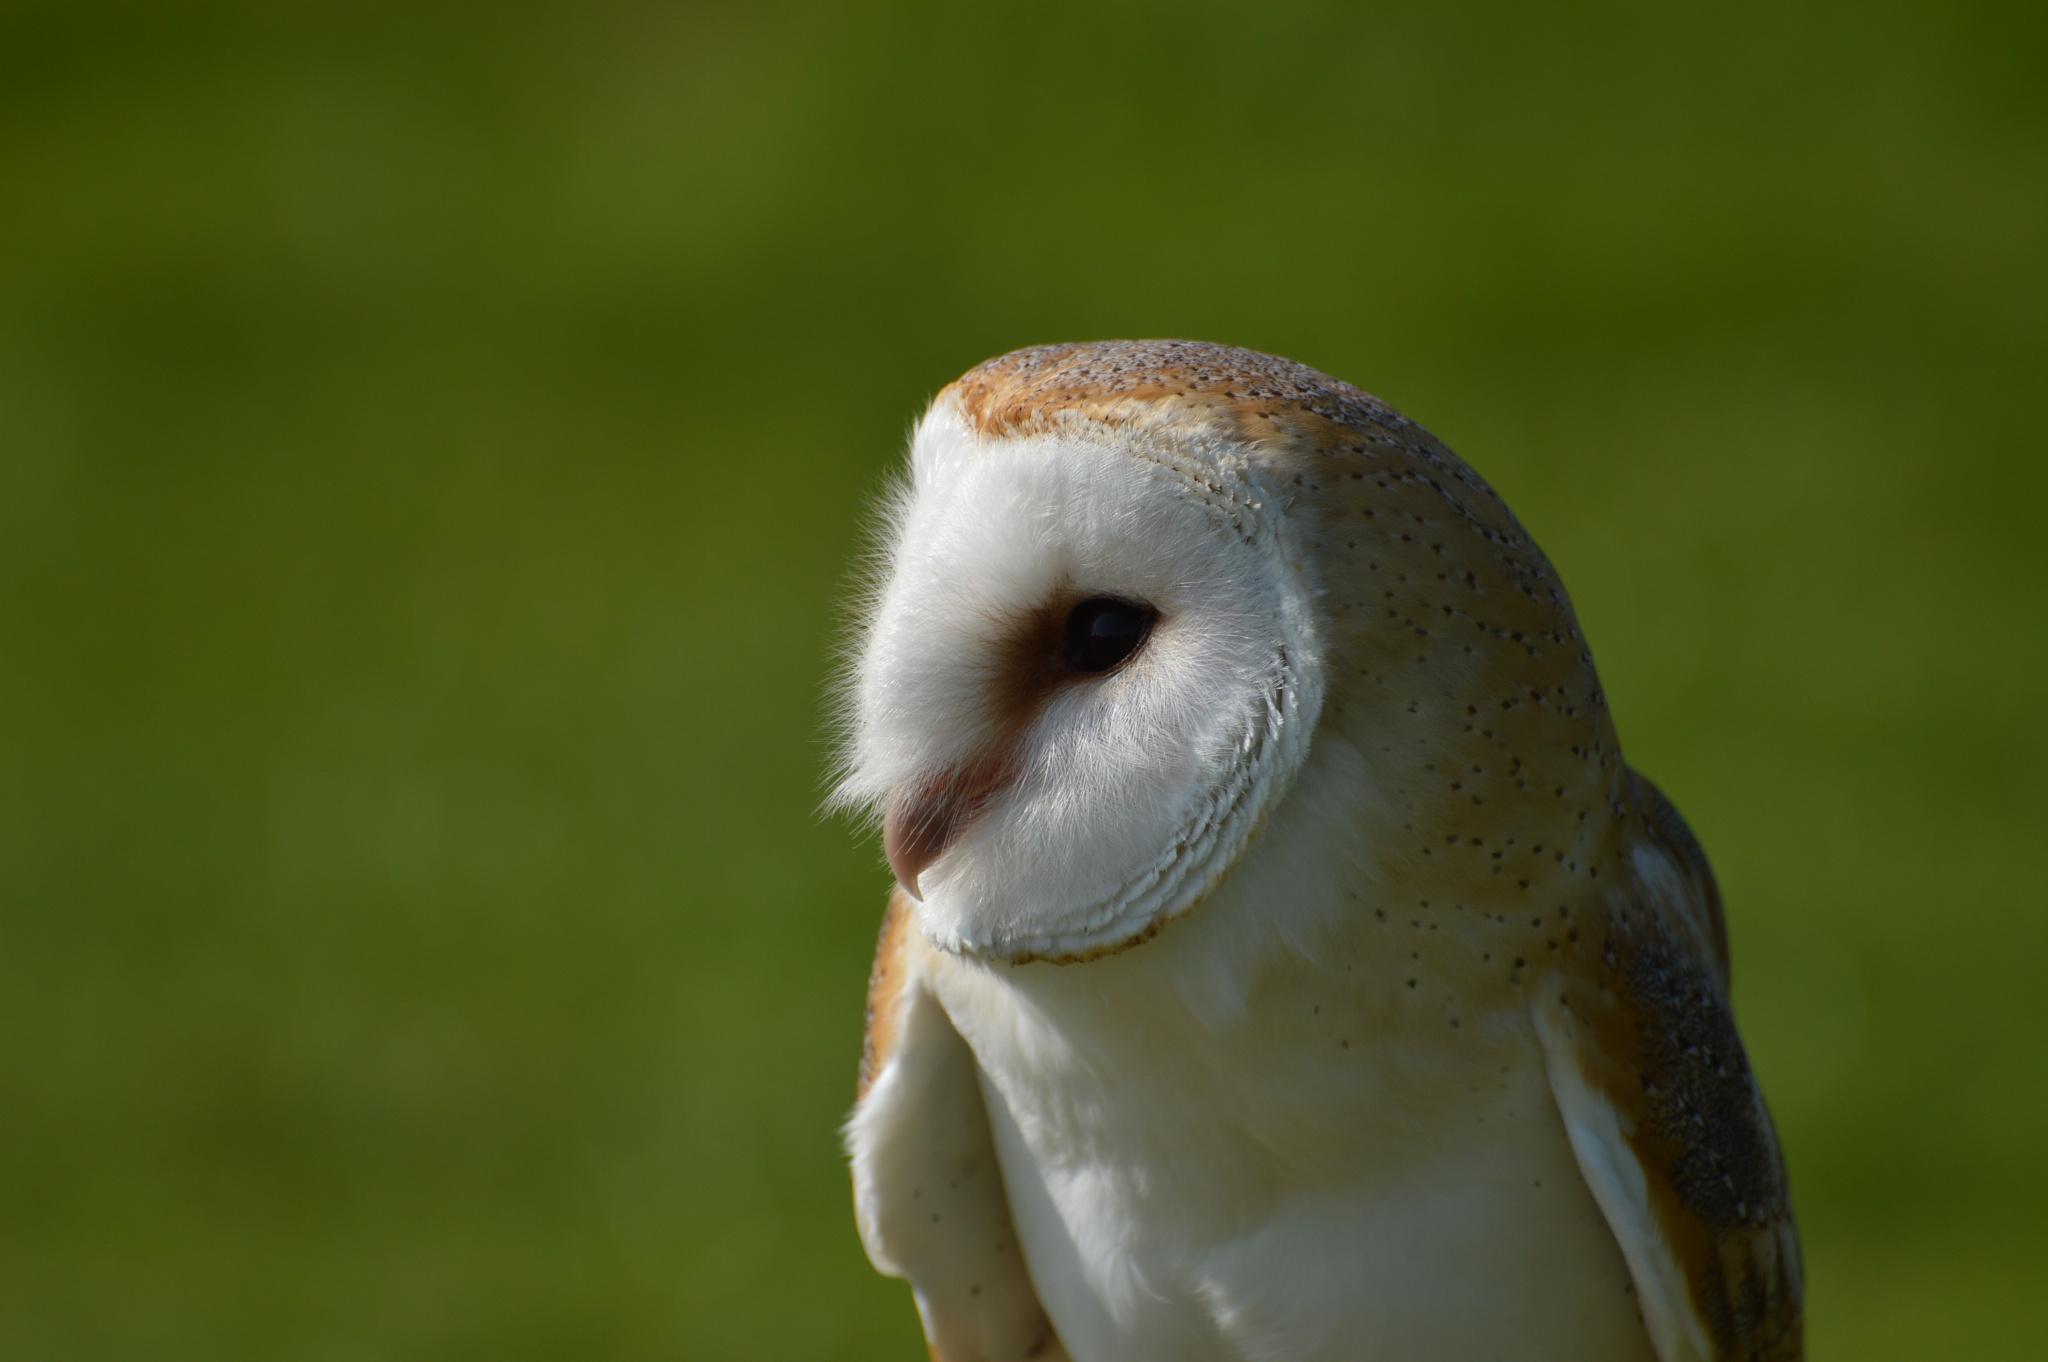 uil,owl by martin vuurpijl